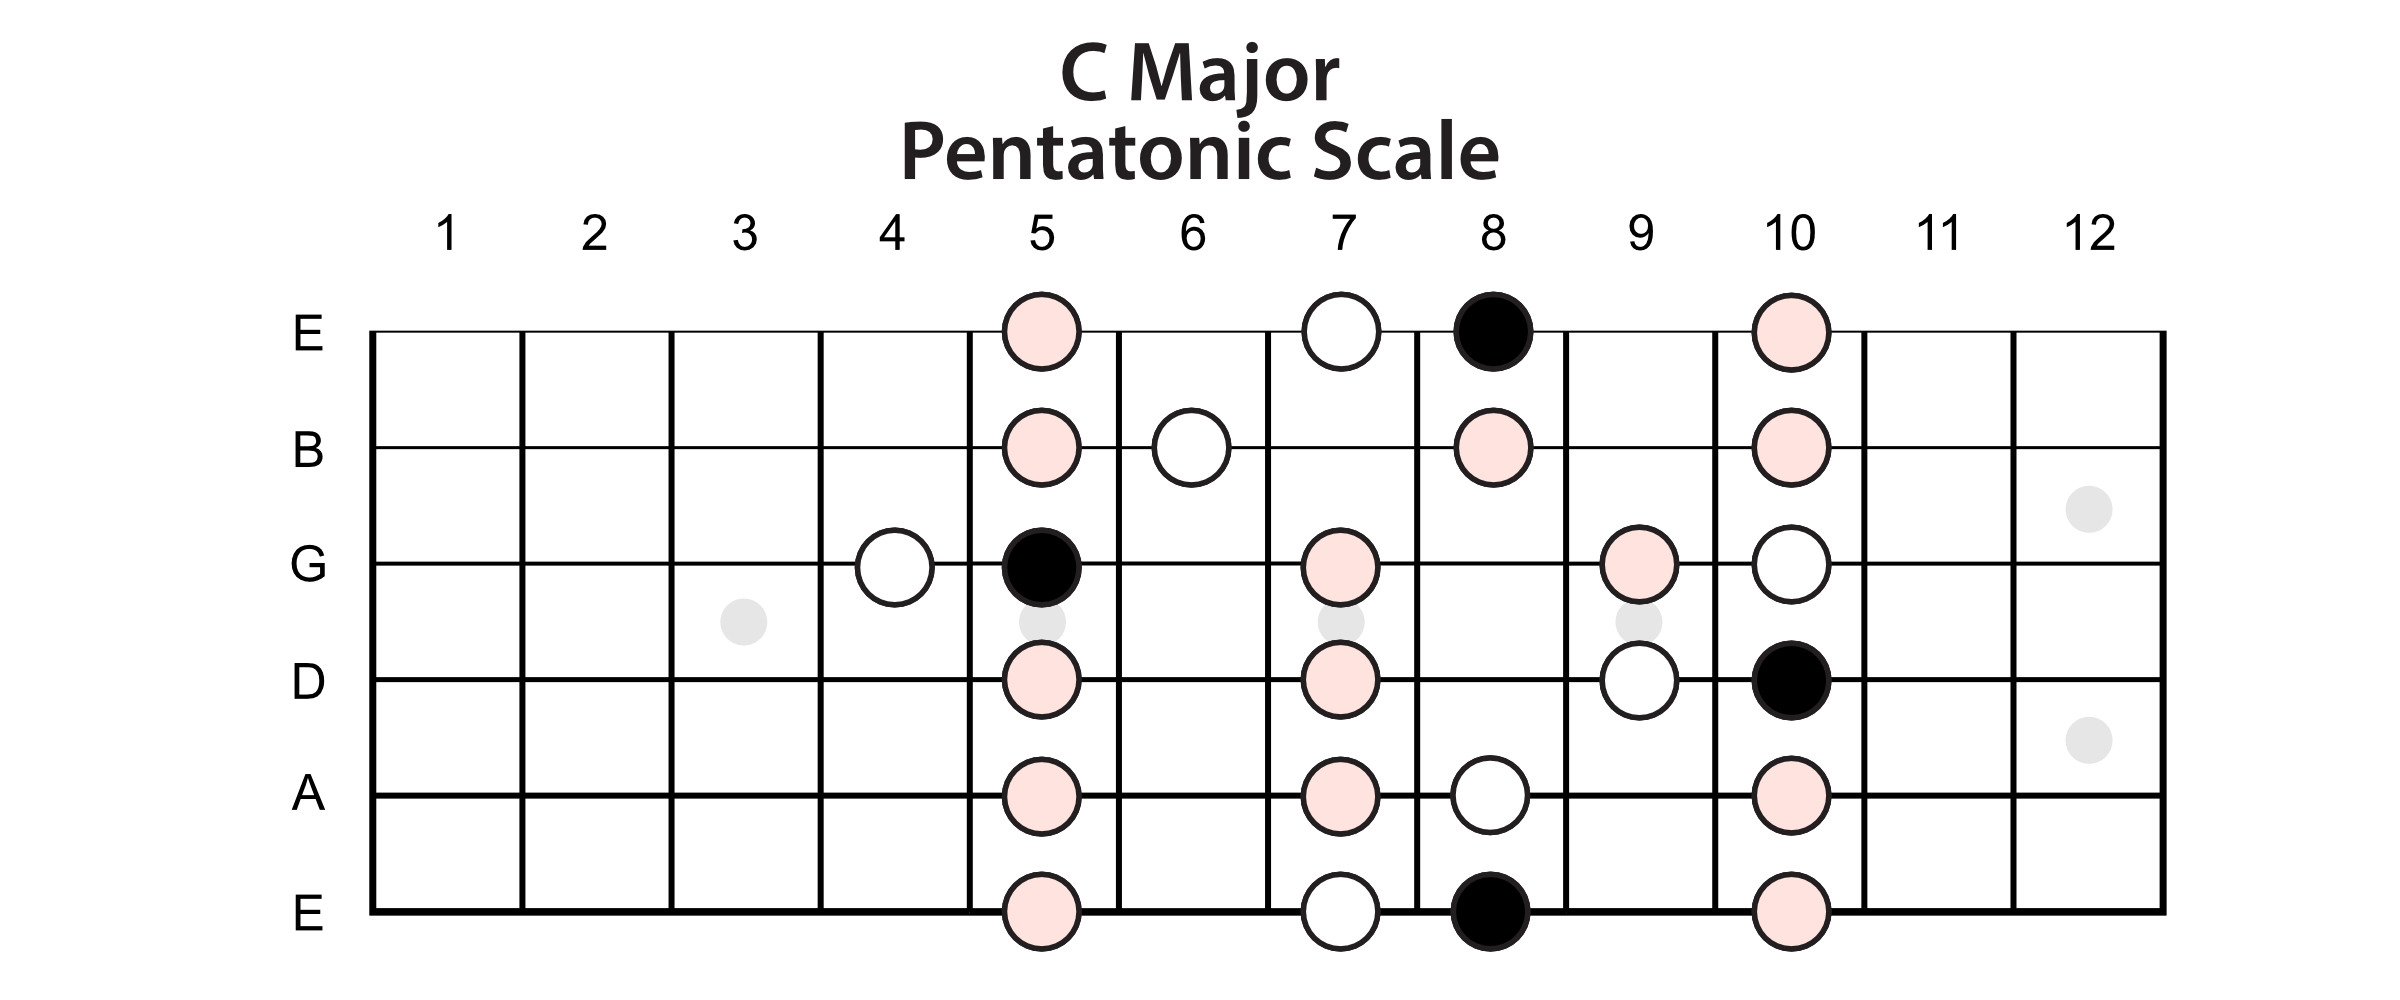 Major Pentatonic Scale Horizontal View